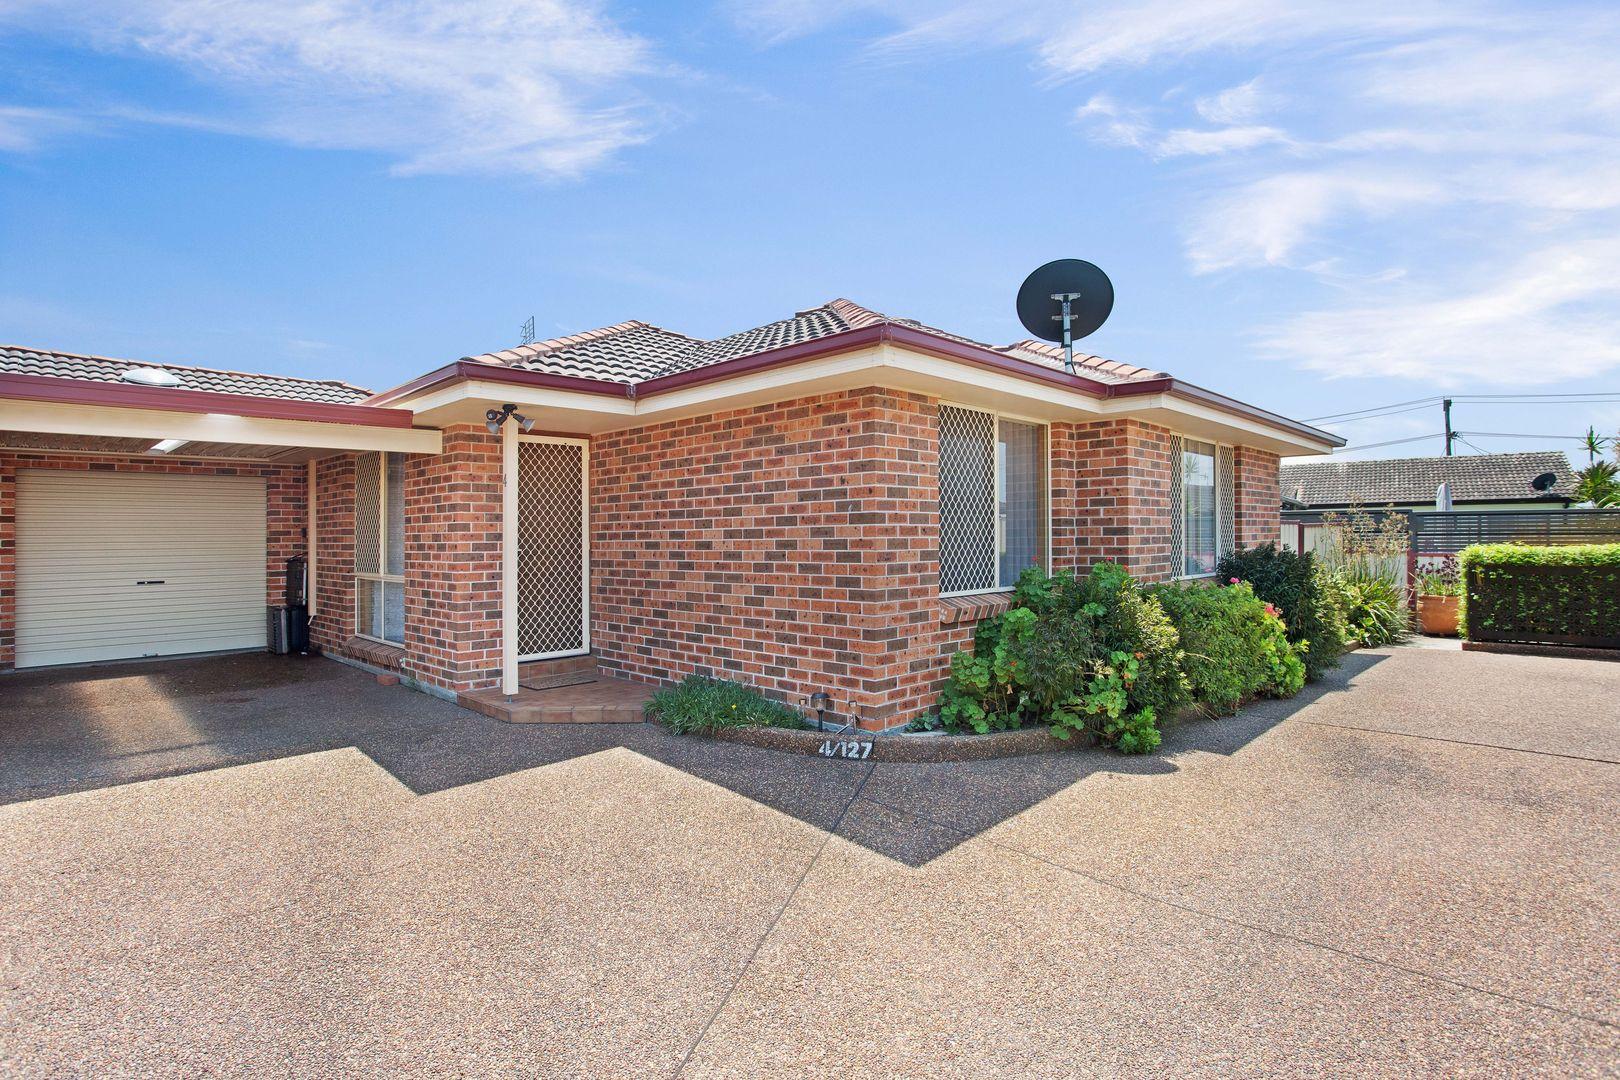 4/127 Anderson Drive, Tarro NSW 2322, Image 0